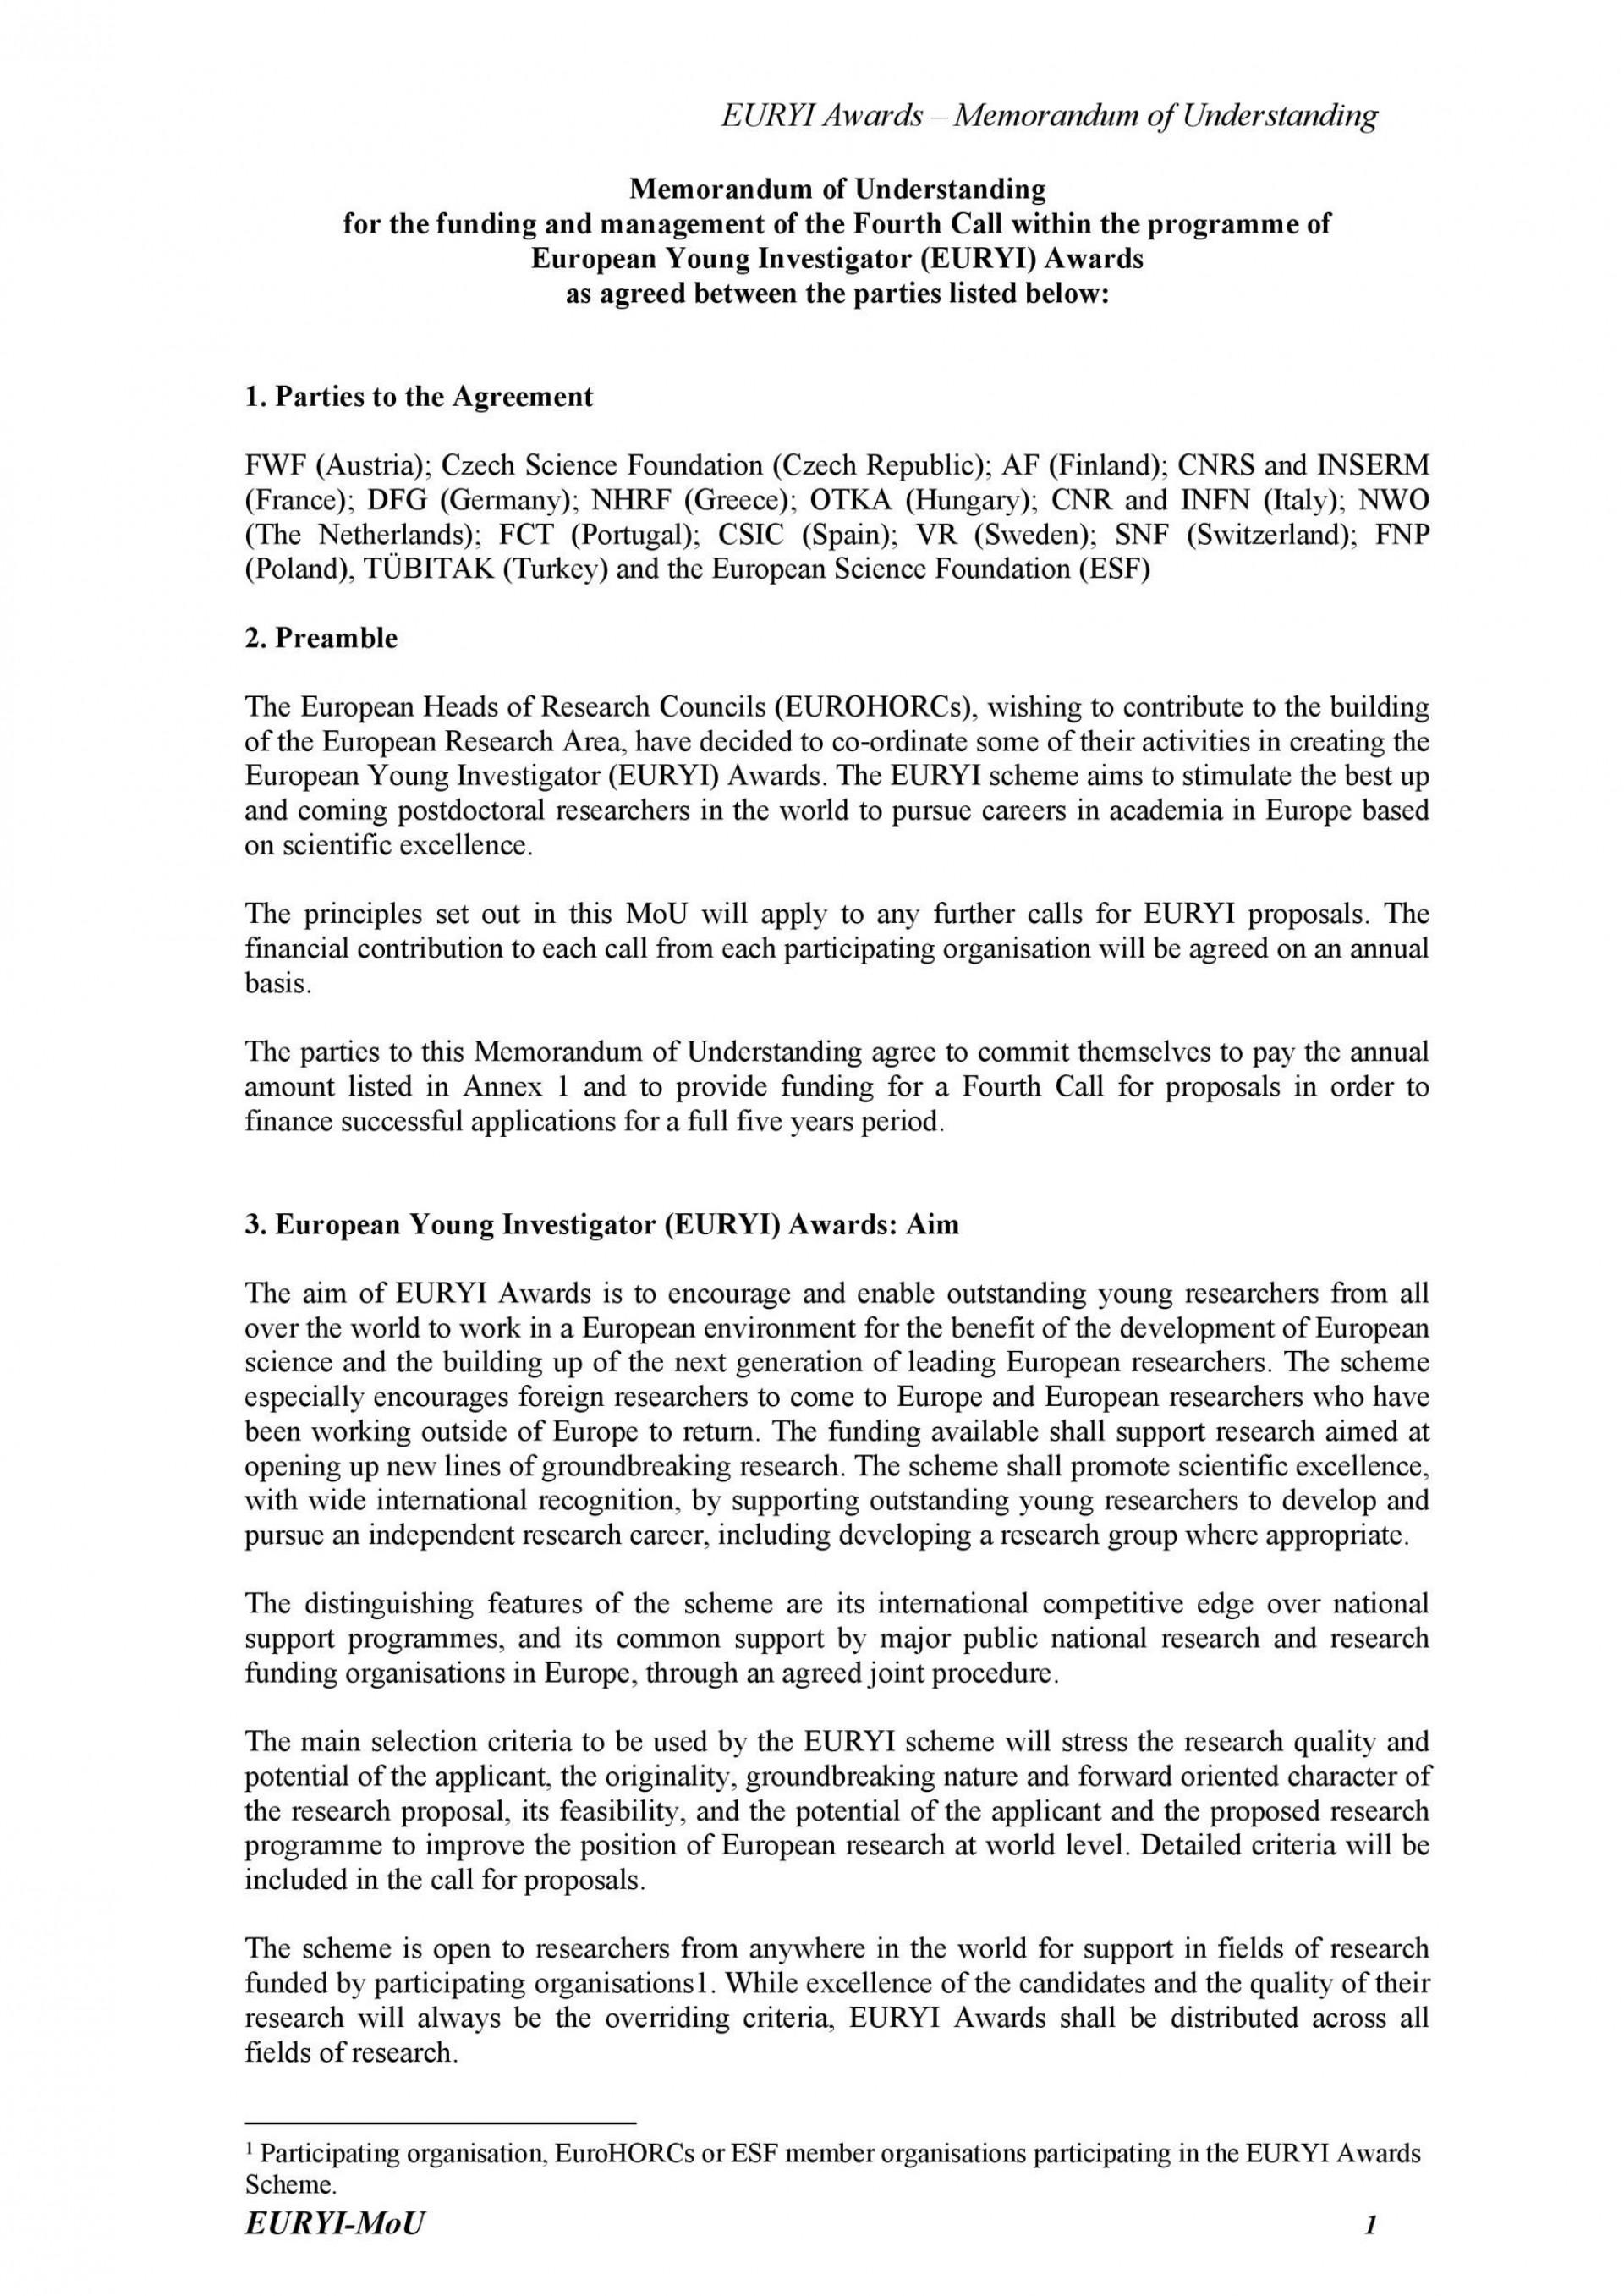 003 Shocking Letter Of Understanding Sample High Definition  Samples Template Word1920